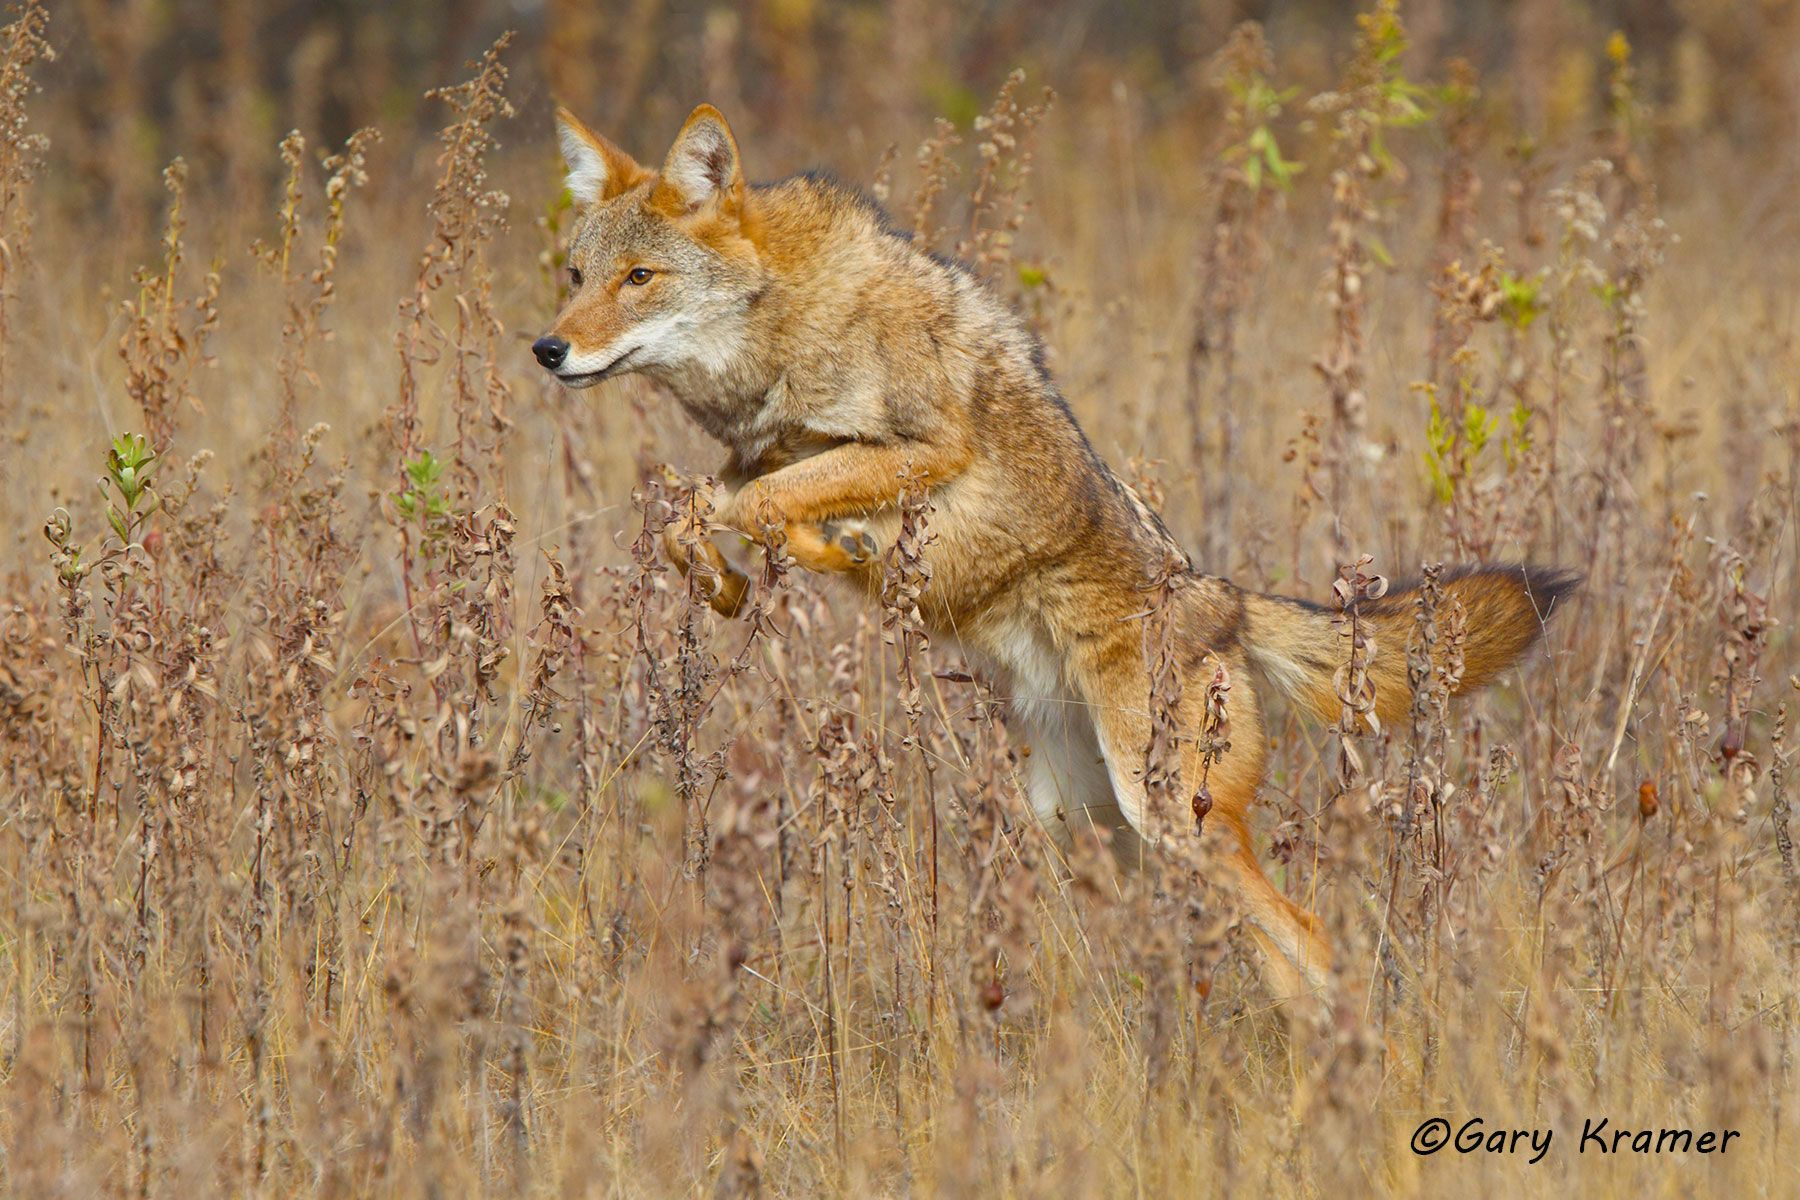 Coyote (Canis latrans) - NMC#634d